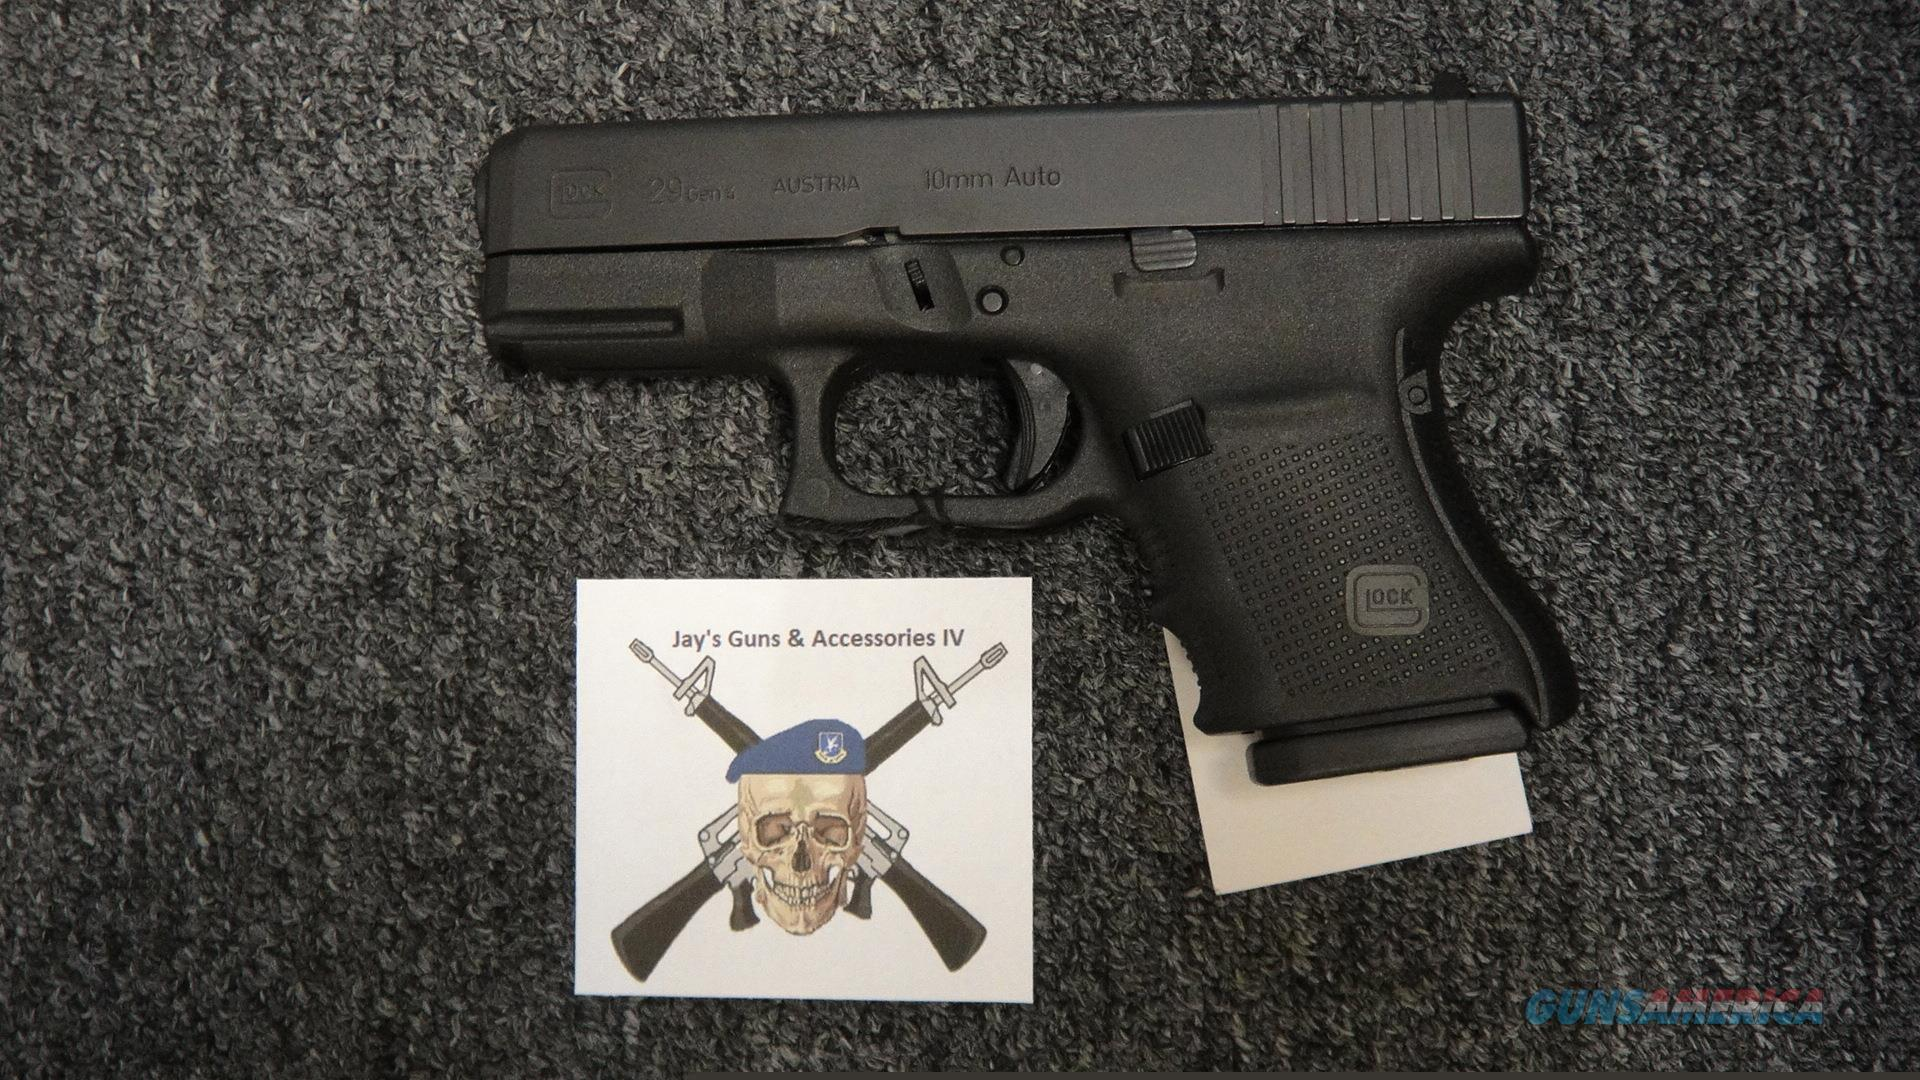 Glock 29 gen 4 (used)  Guns > Pistols > Glock Pistols > 29/30/36